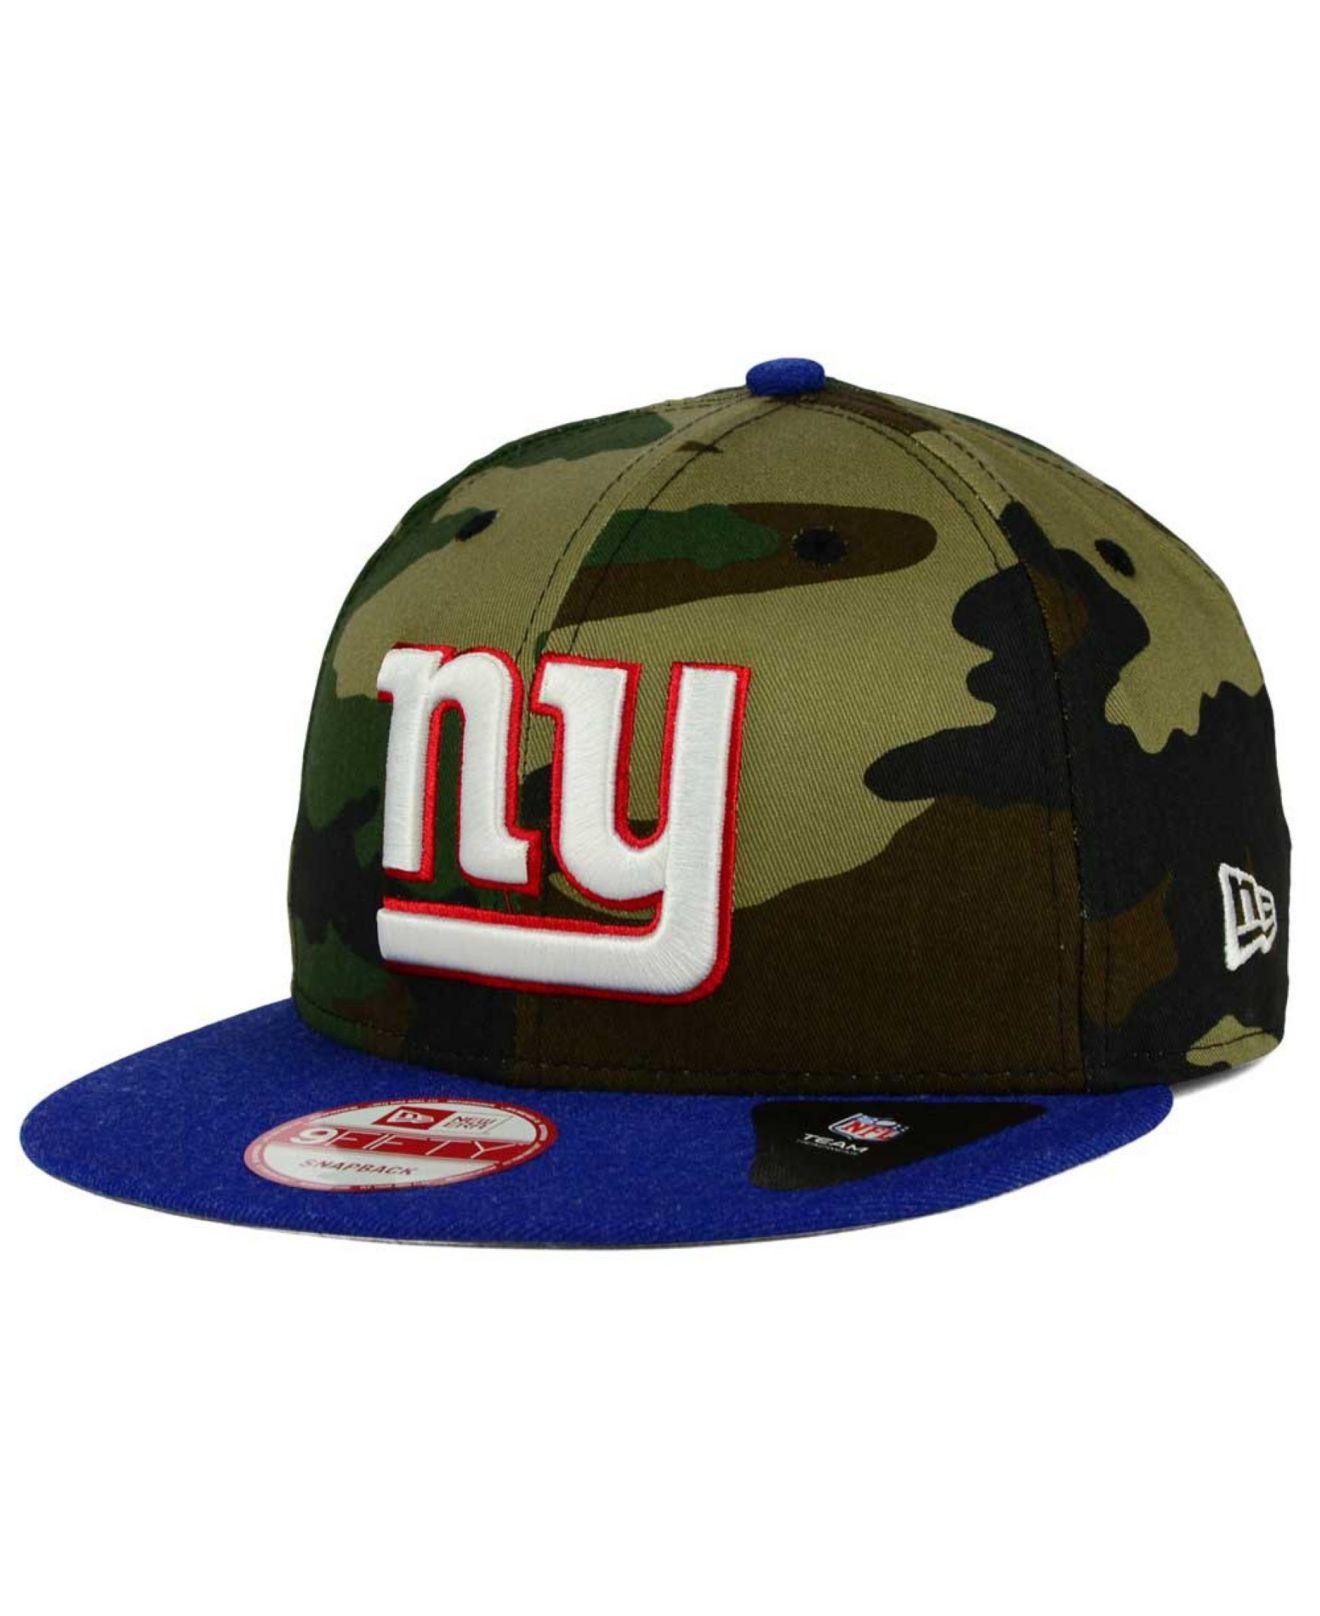 ktz new york giants camo heather 9fifty snapback cap in. Black Bedroom Furniture Sets. Home Design Ideas